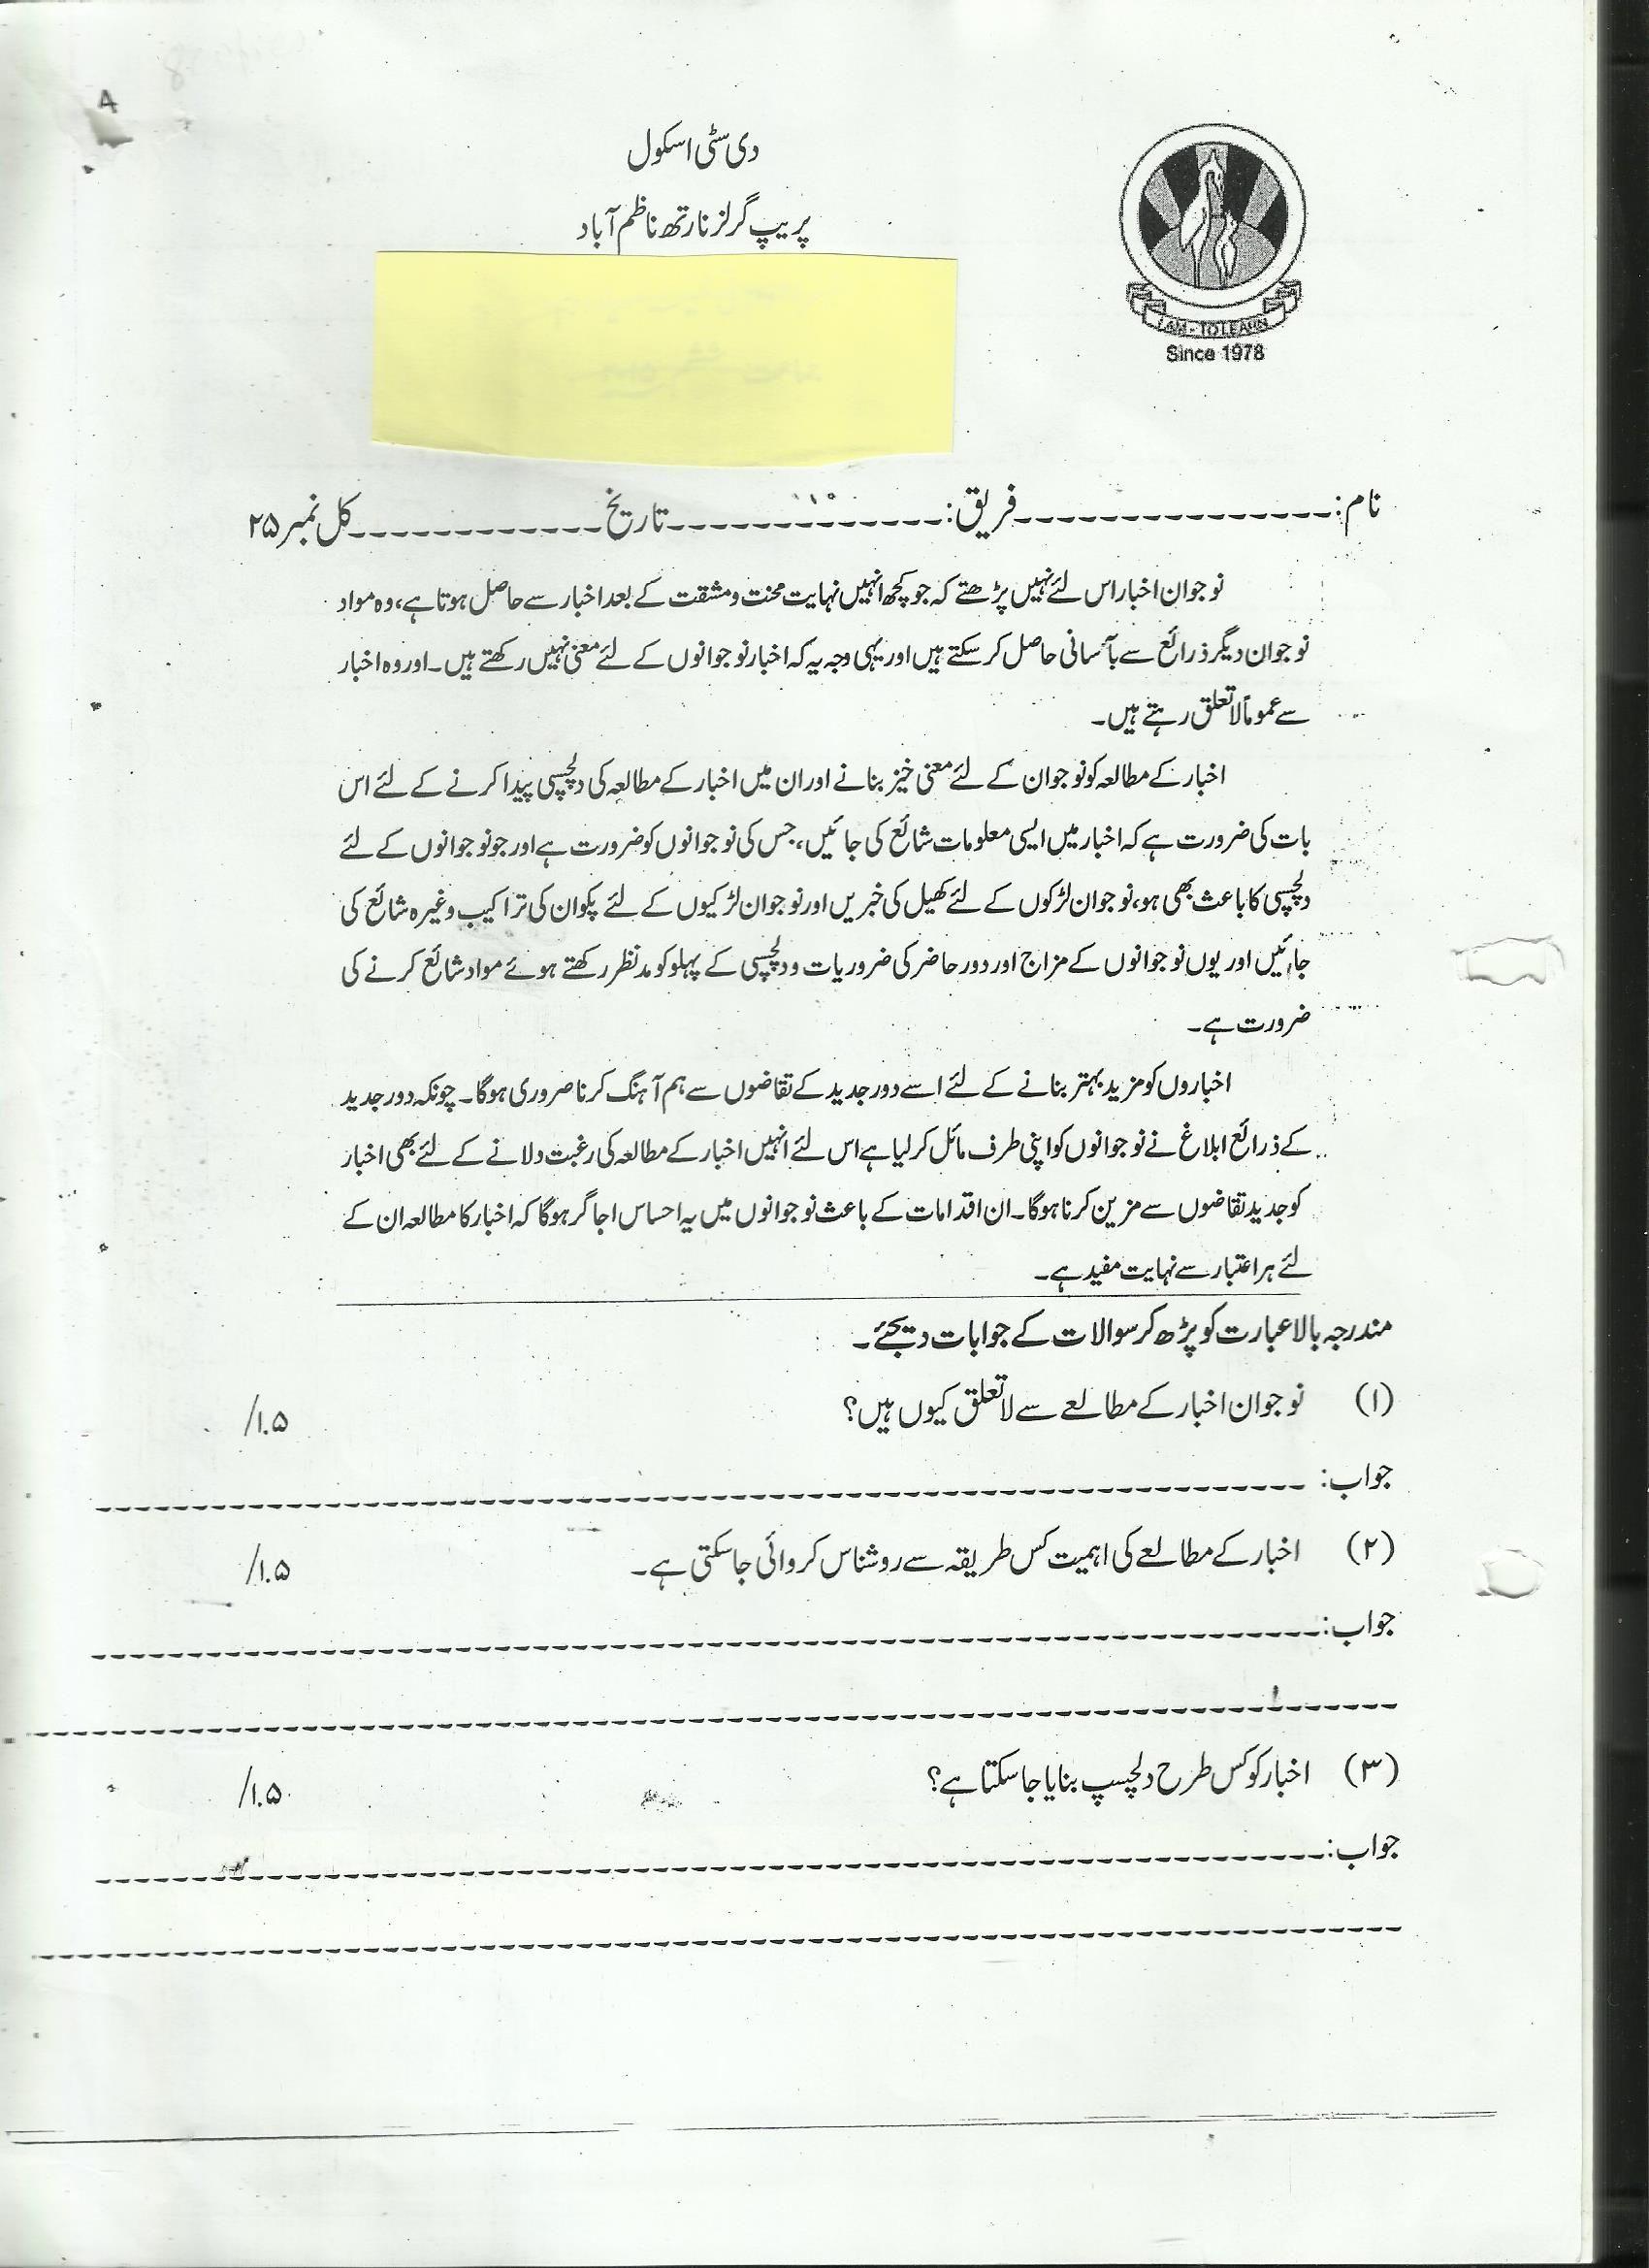 Urdu Tafheem Worksheets For Grade 4 401902 Worksheets Library 1st Grade Reading Worksheets Reading Comprehension Worksheets Third Grade Reading Worksheets [ 2338 x 1700 Pixel ]